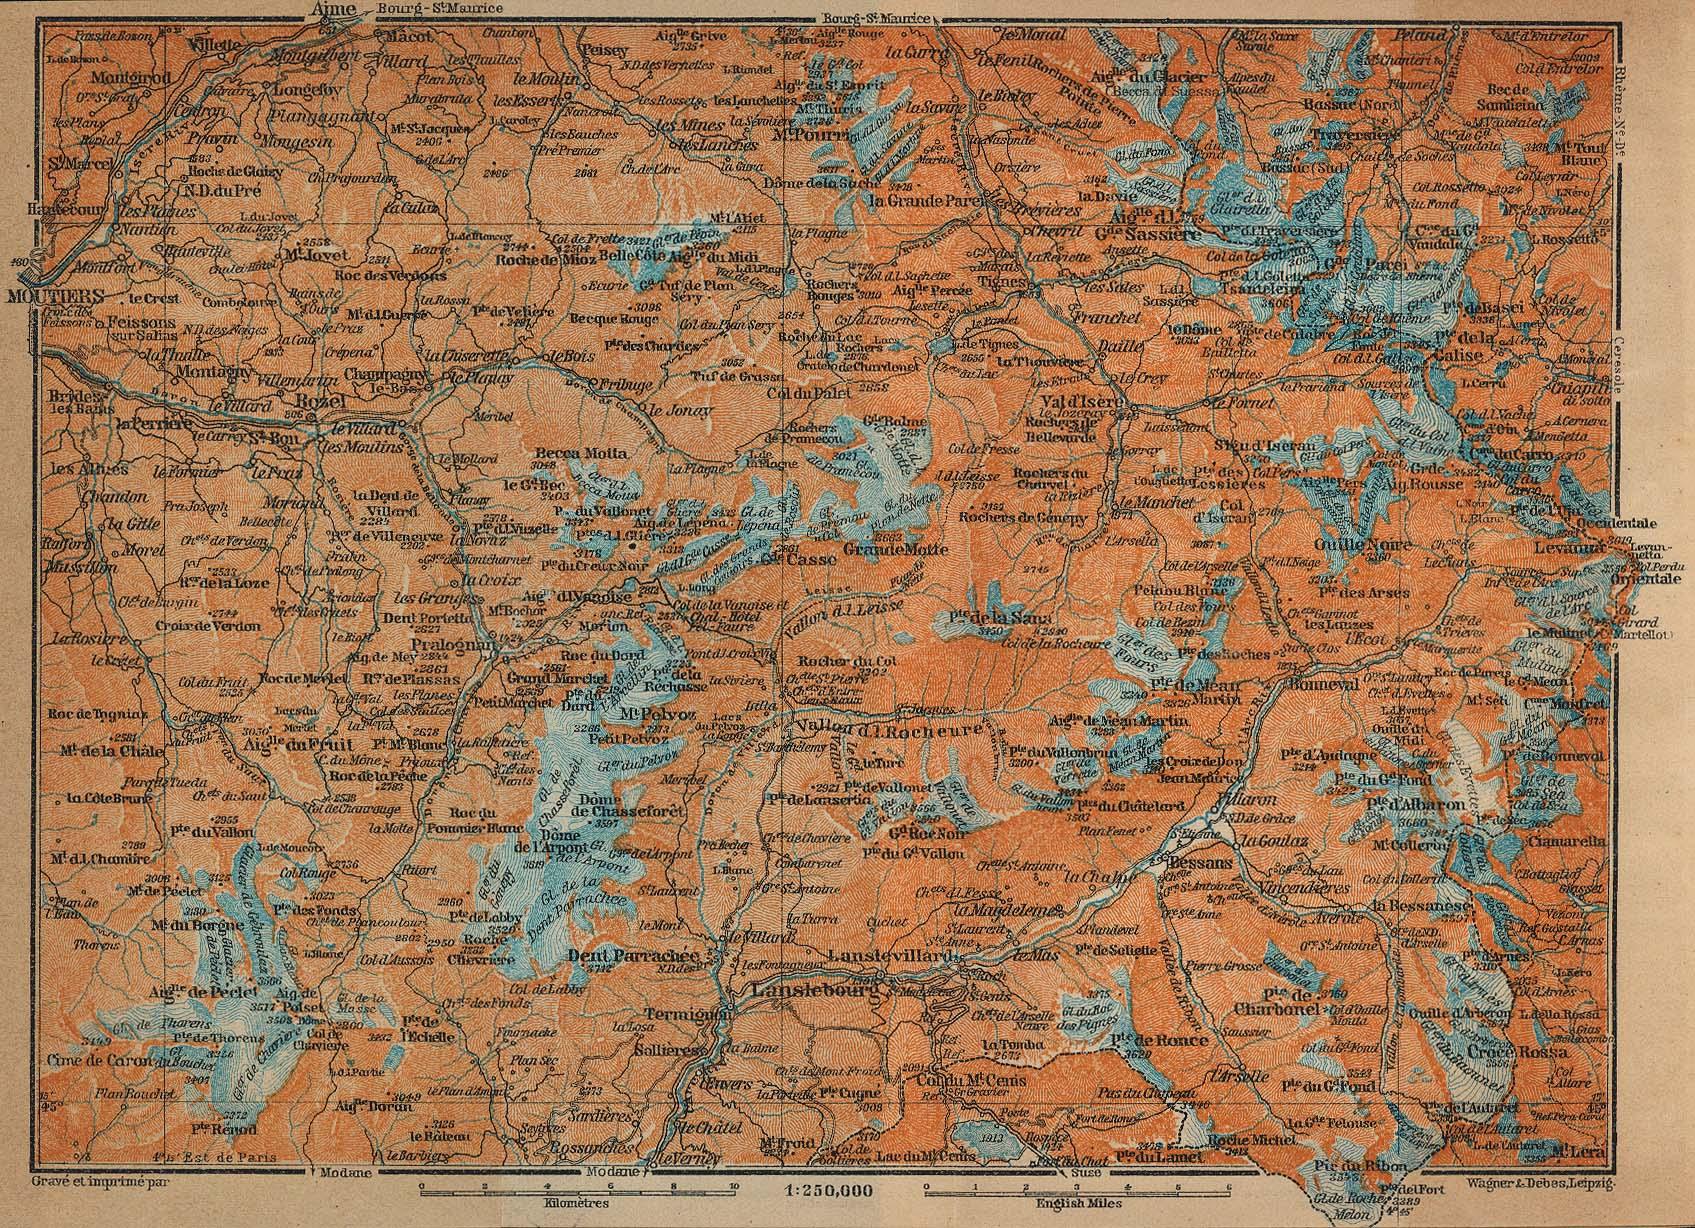 Mapa del Tarentaise y Maurienne, Francia 1914